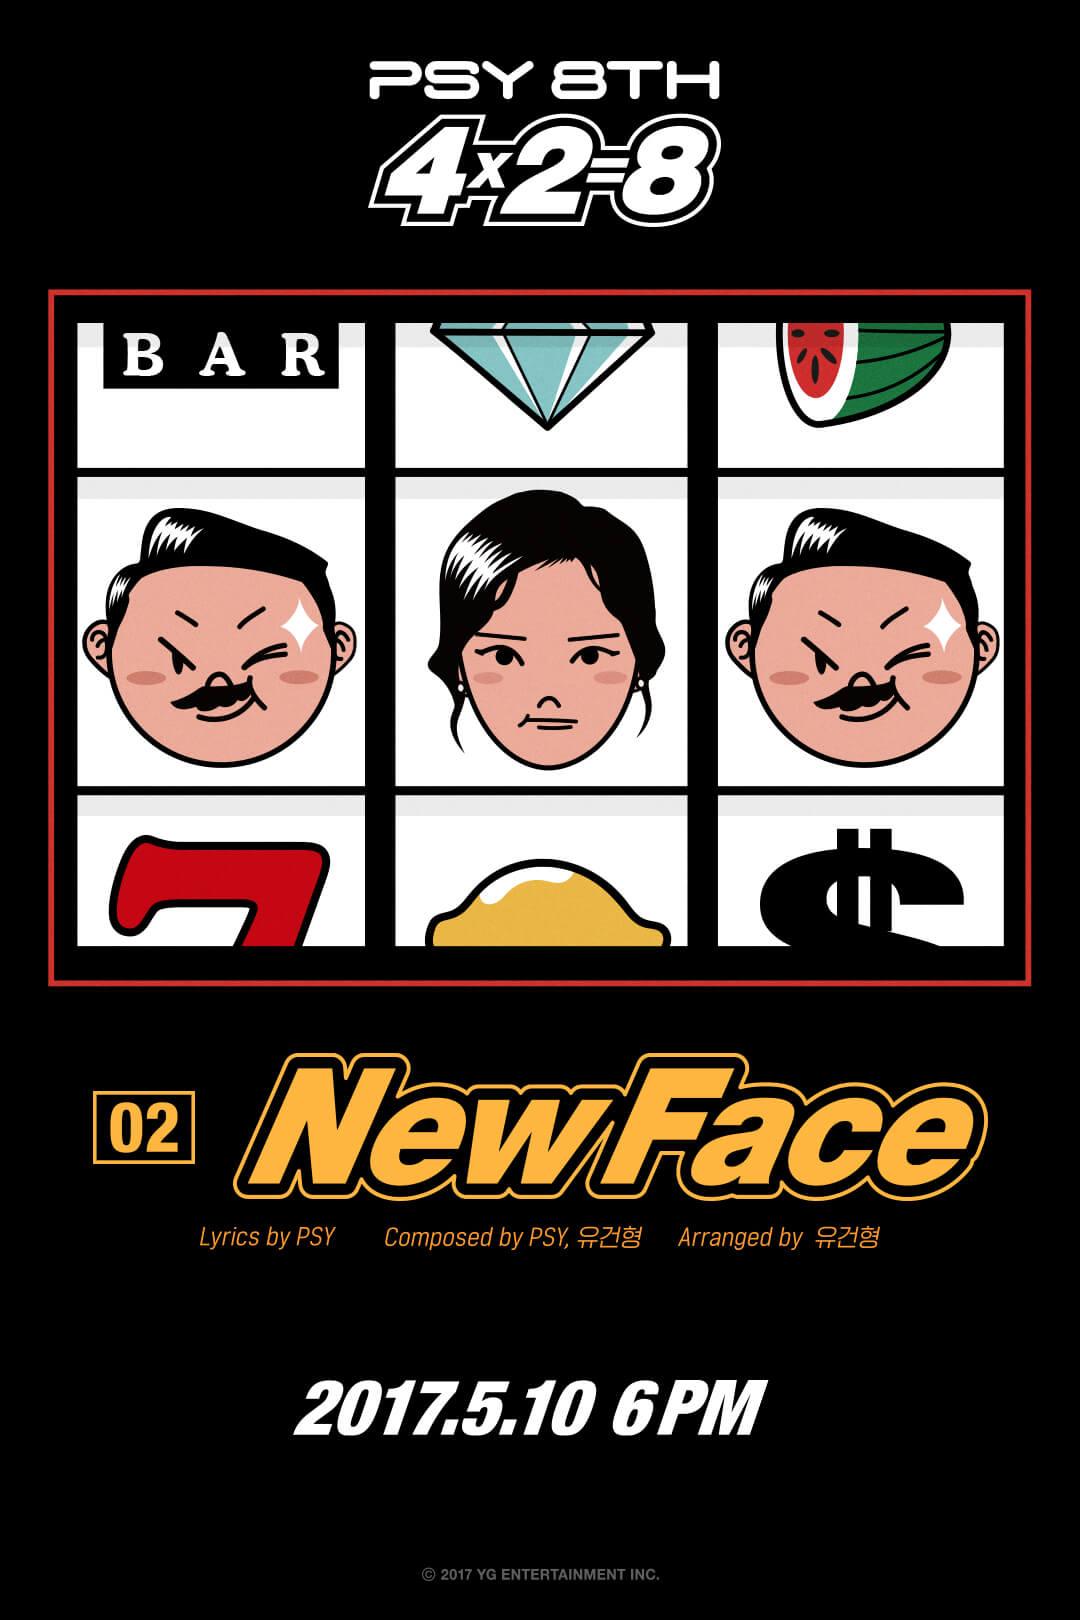 02-2 NewFace (1)